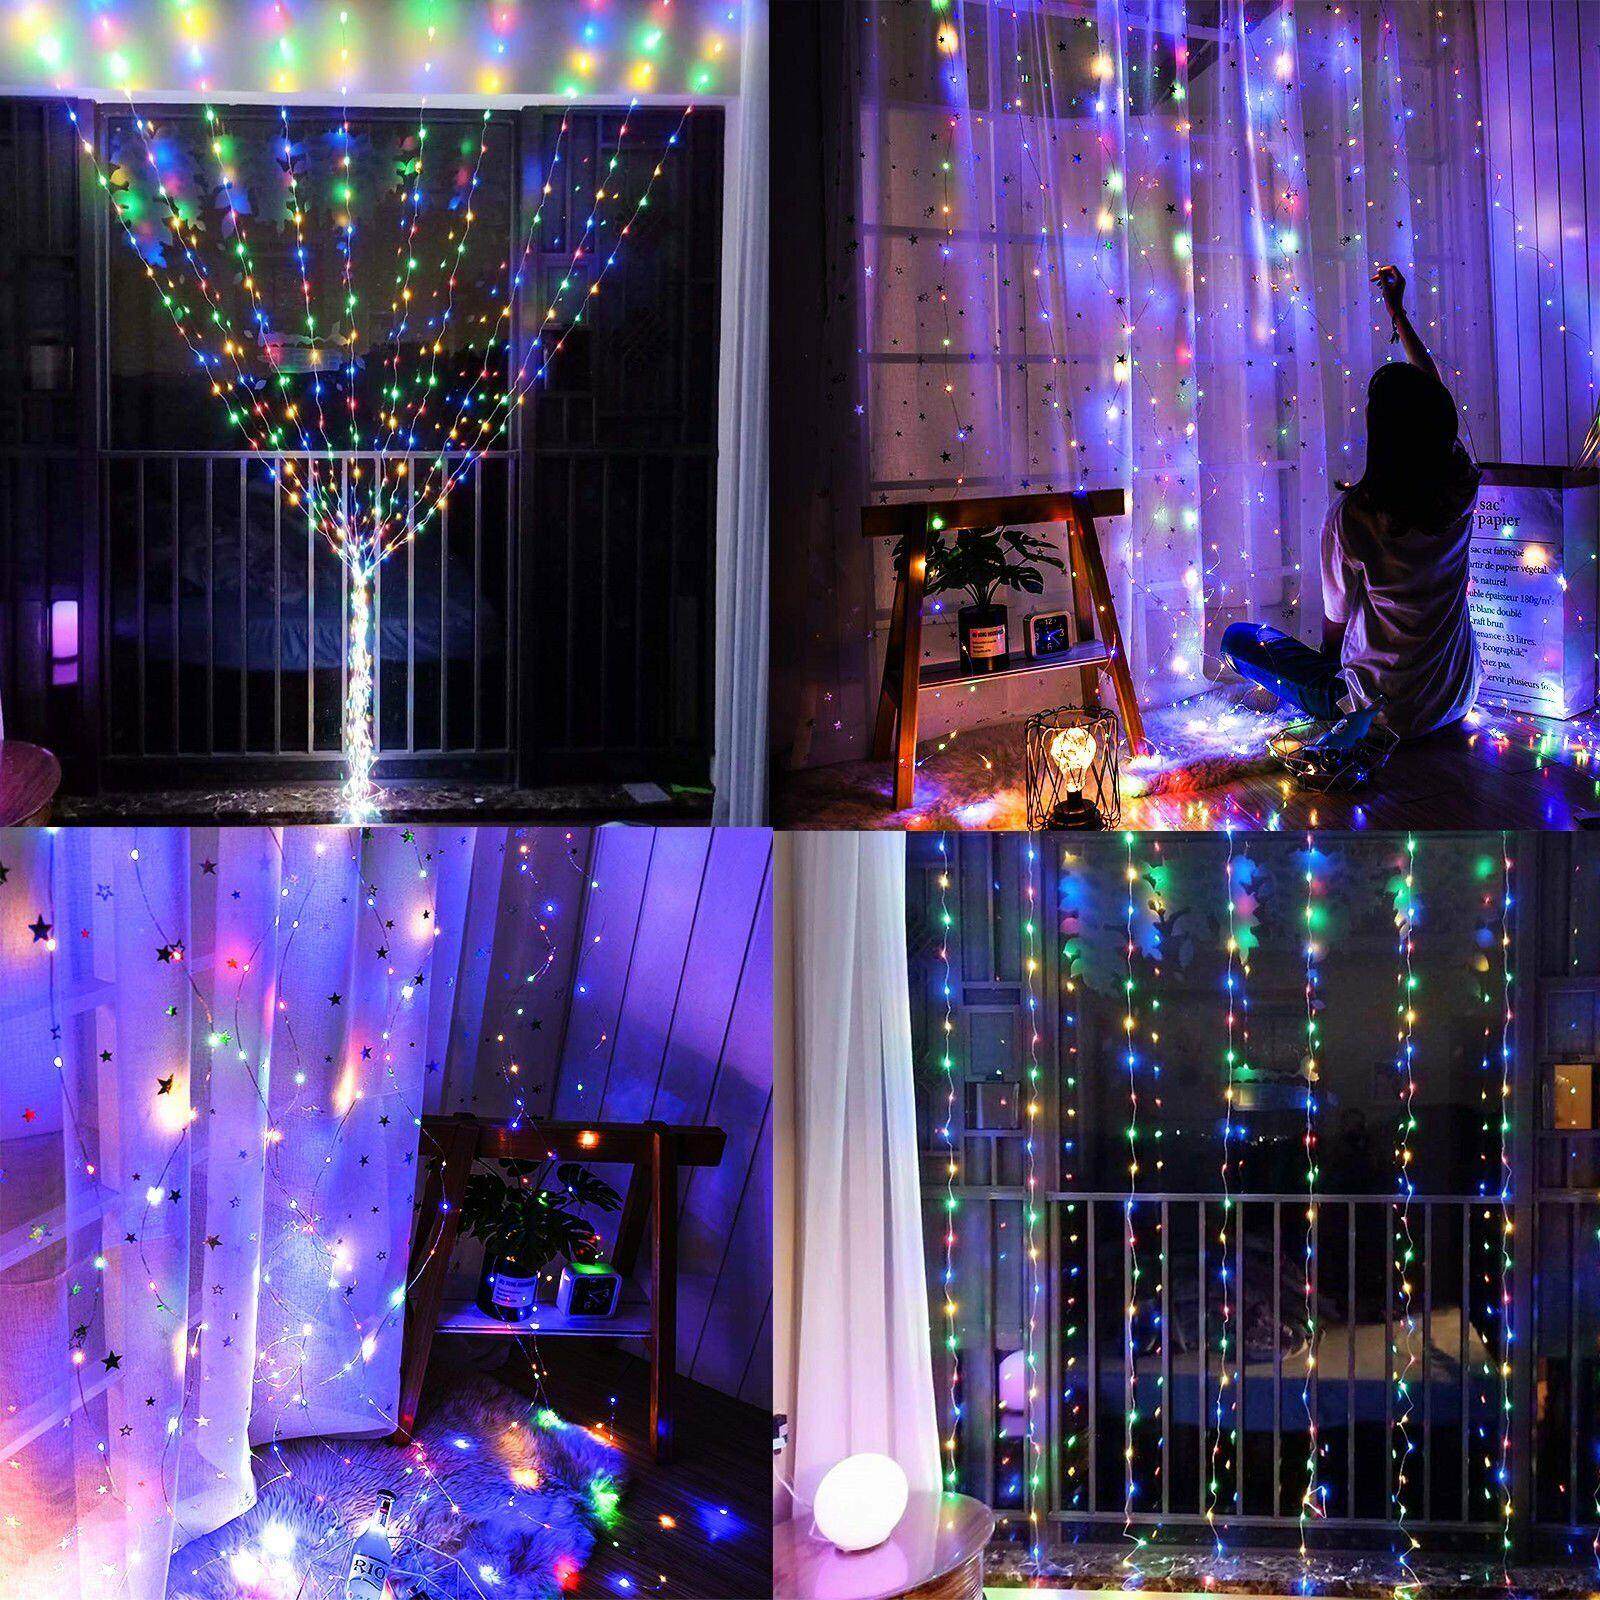 300 LED Curtain Fairy String Lights USB Home Window Bedroom